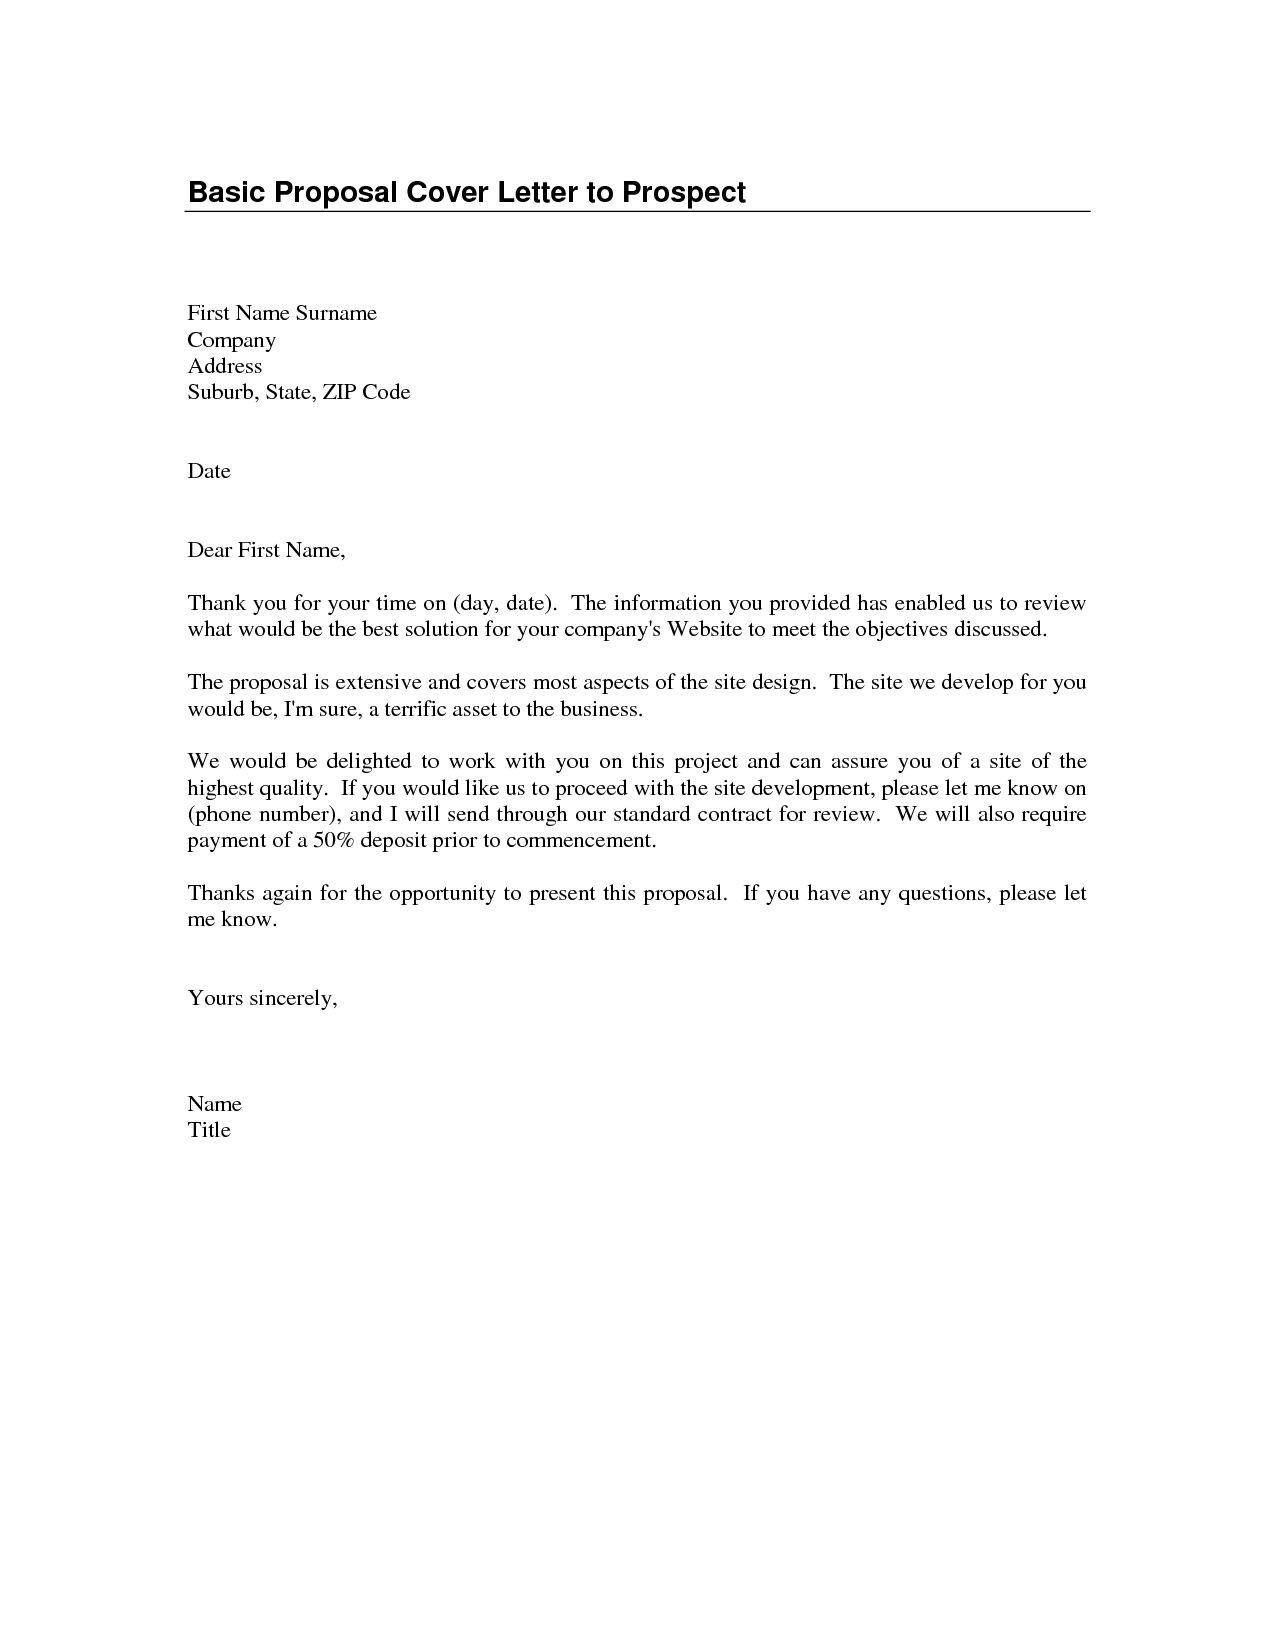 25 Cover Letter Outline Cover Letter Outline Basic